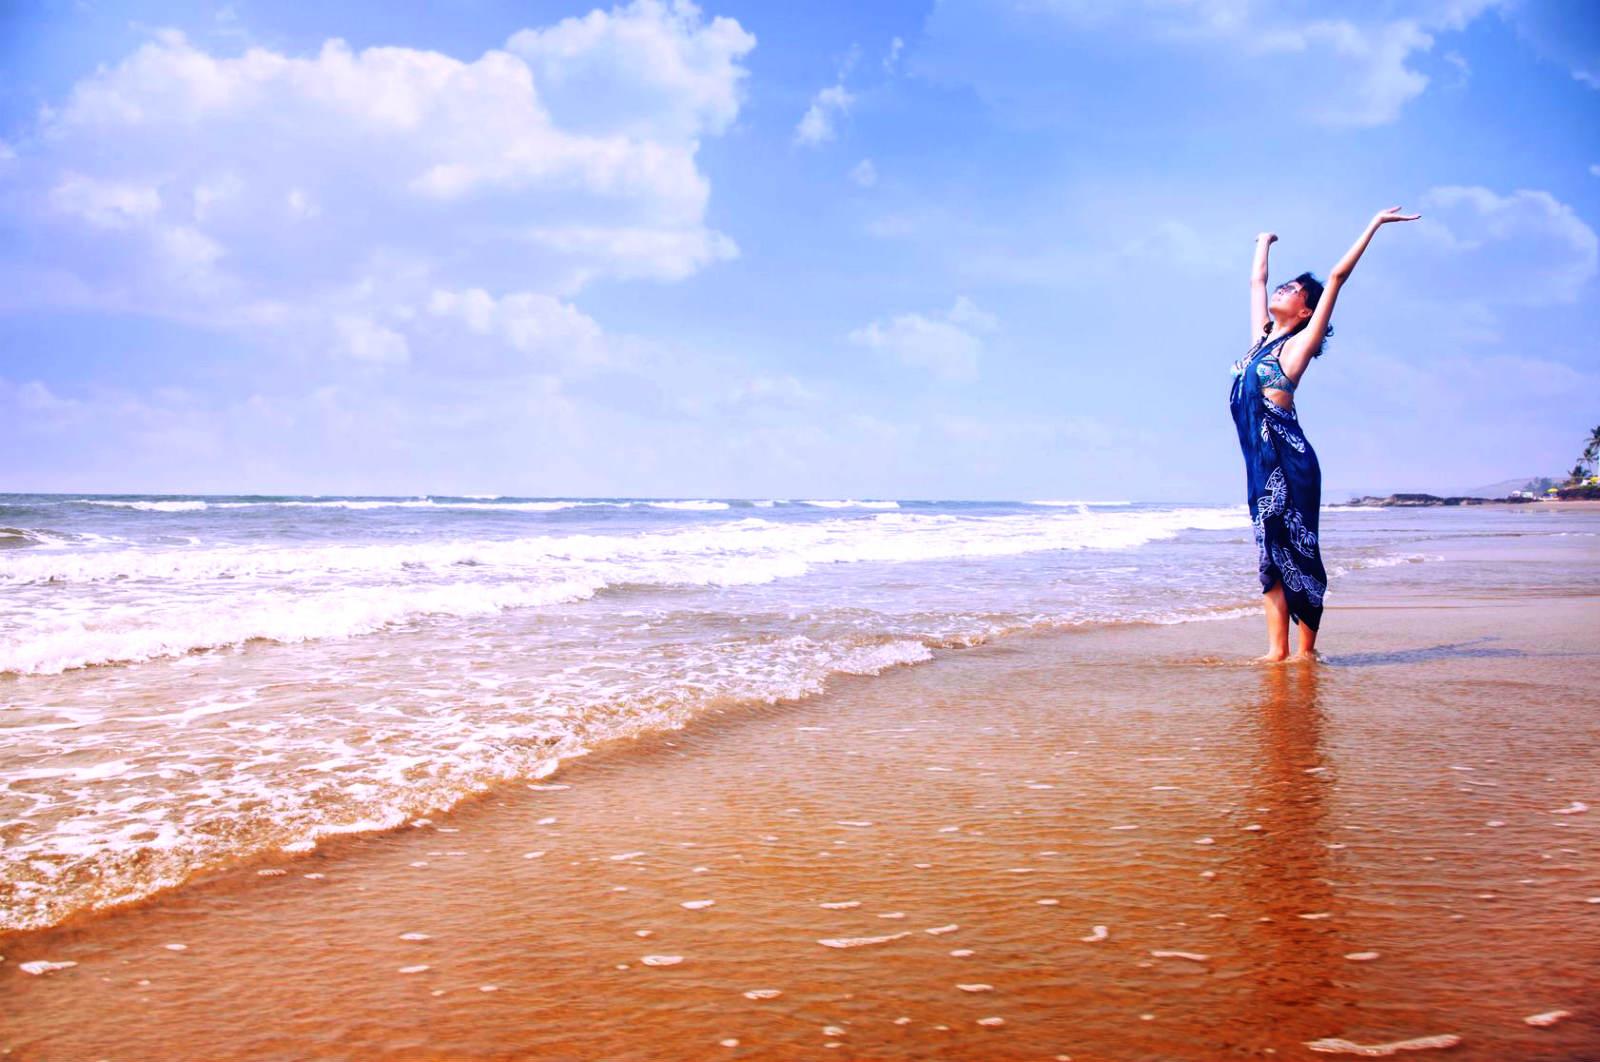 Goa Beach Wallpaper 40 Pictures 1600x1062